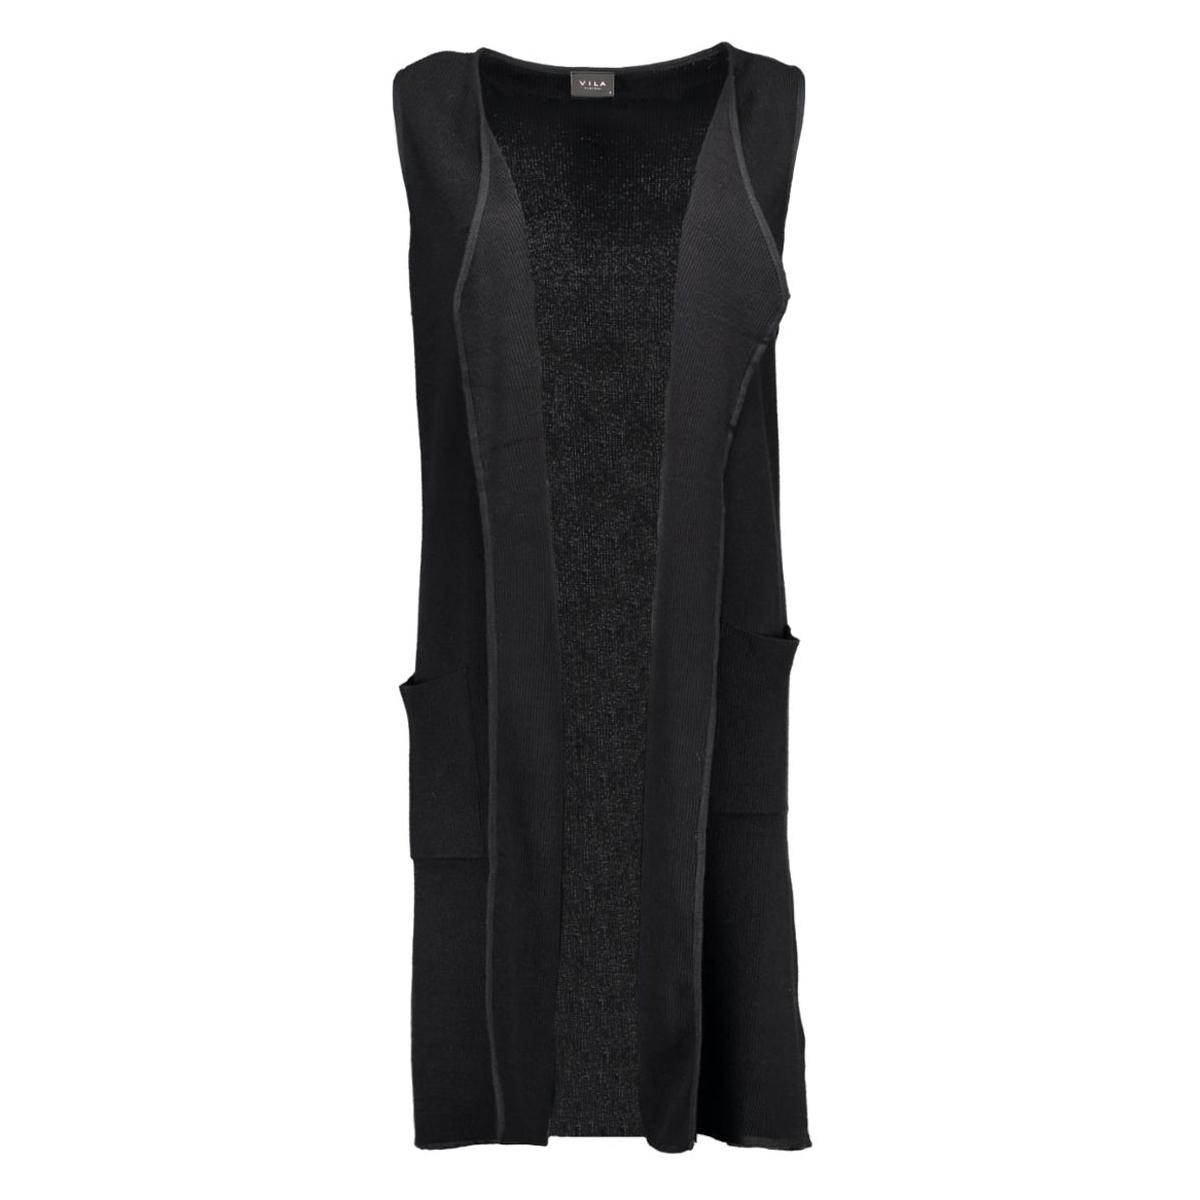 viandrea knit waistcoat 14035655 vila vest black